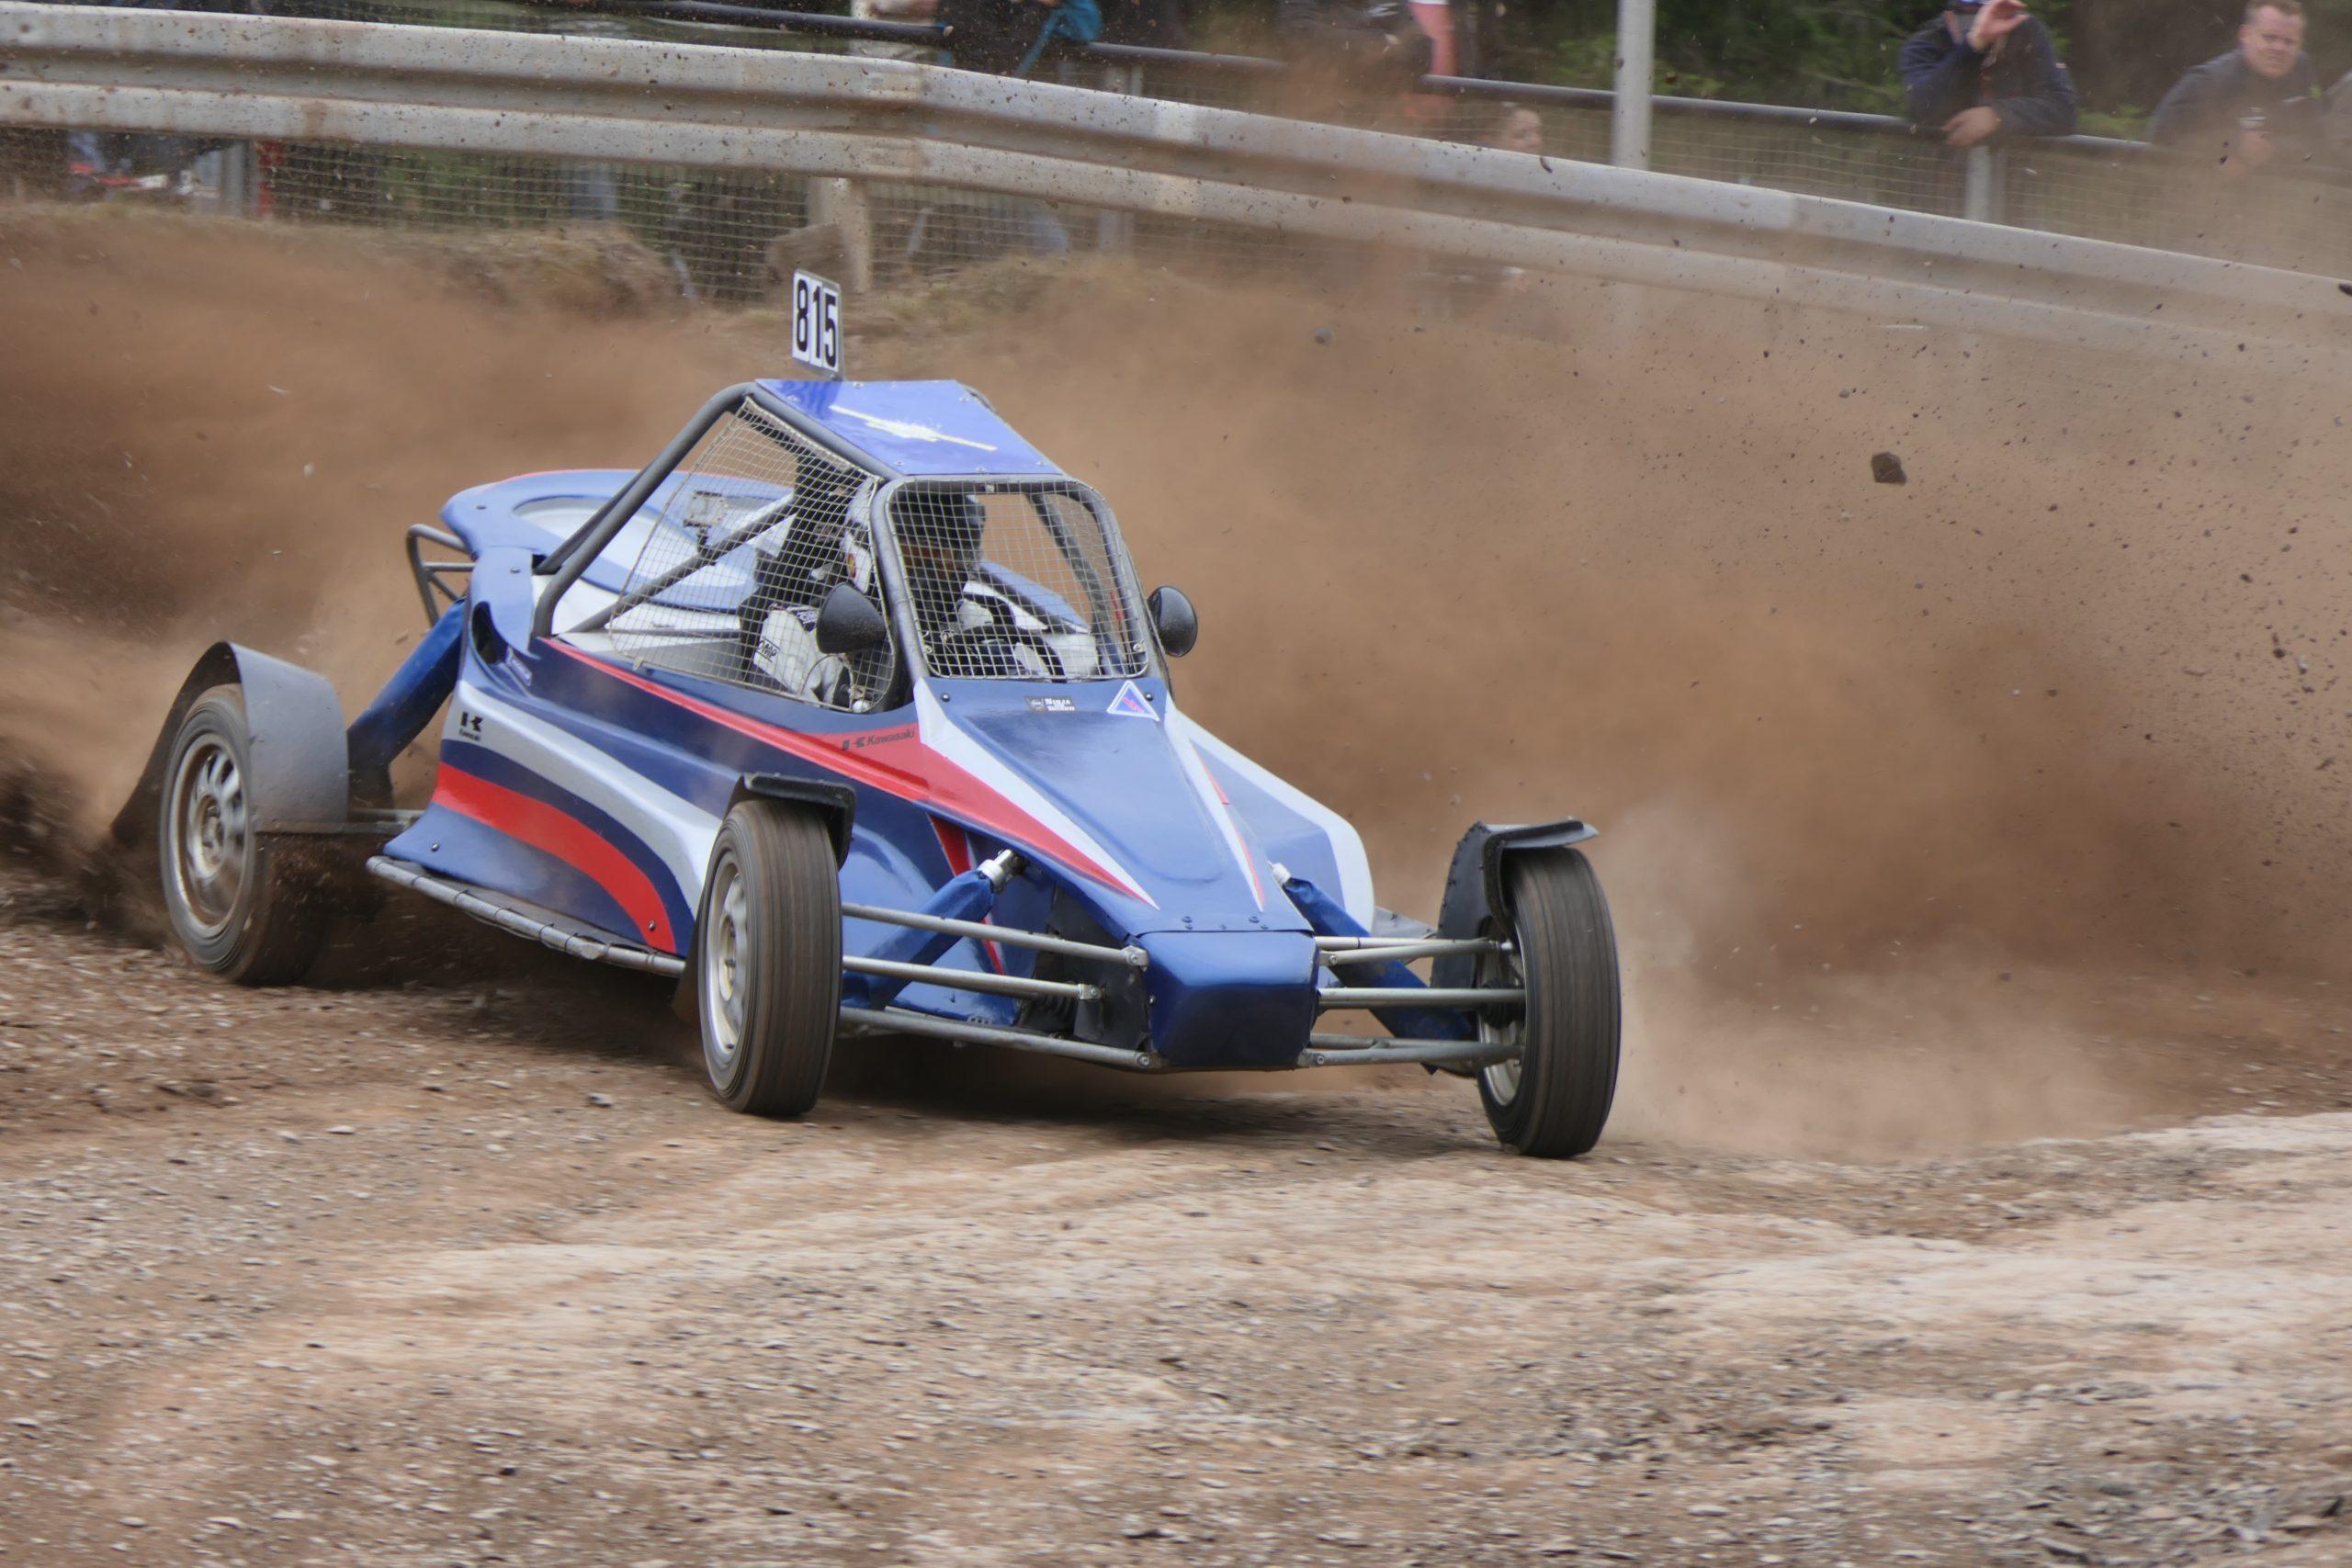 motorsport, autocross, race